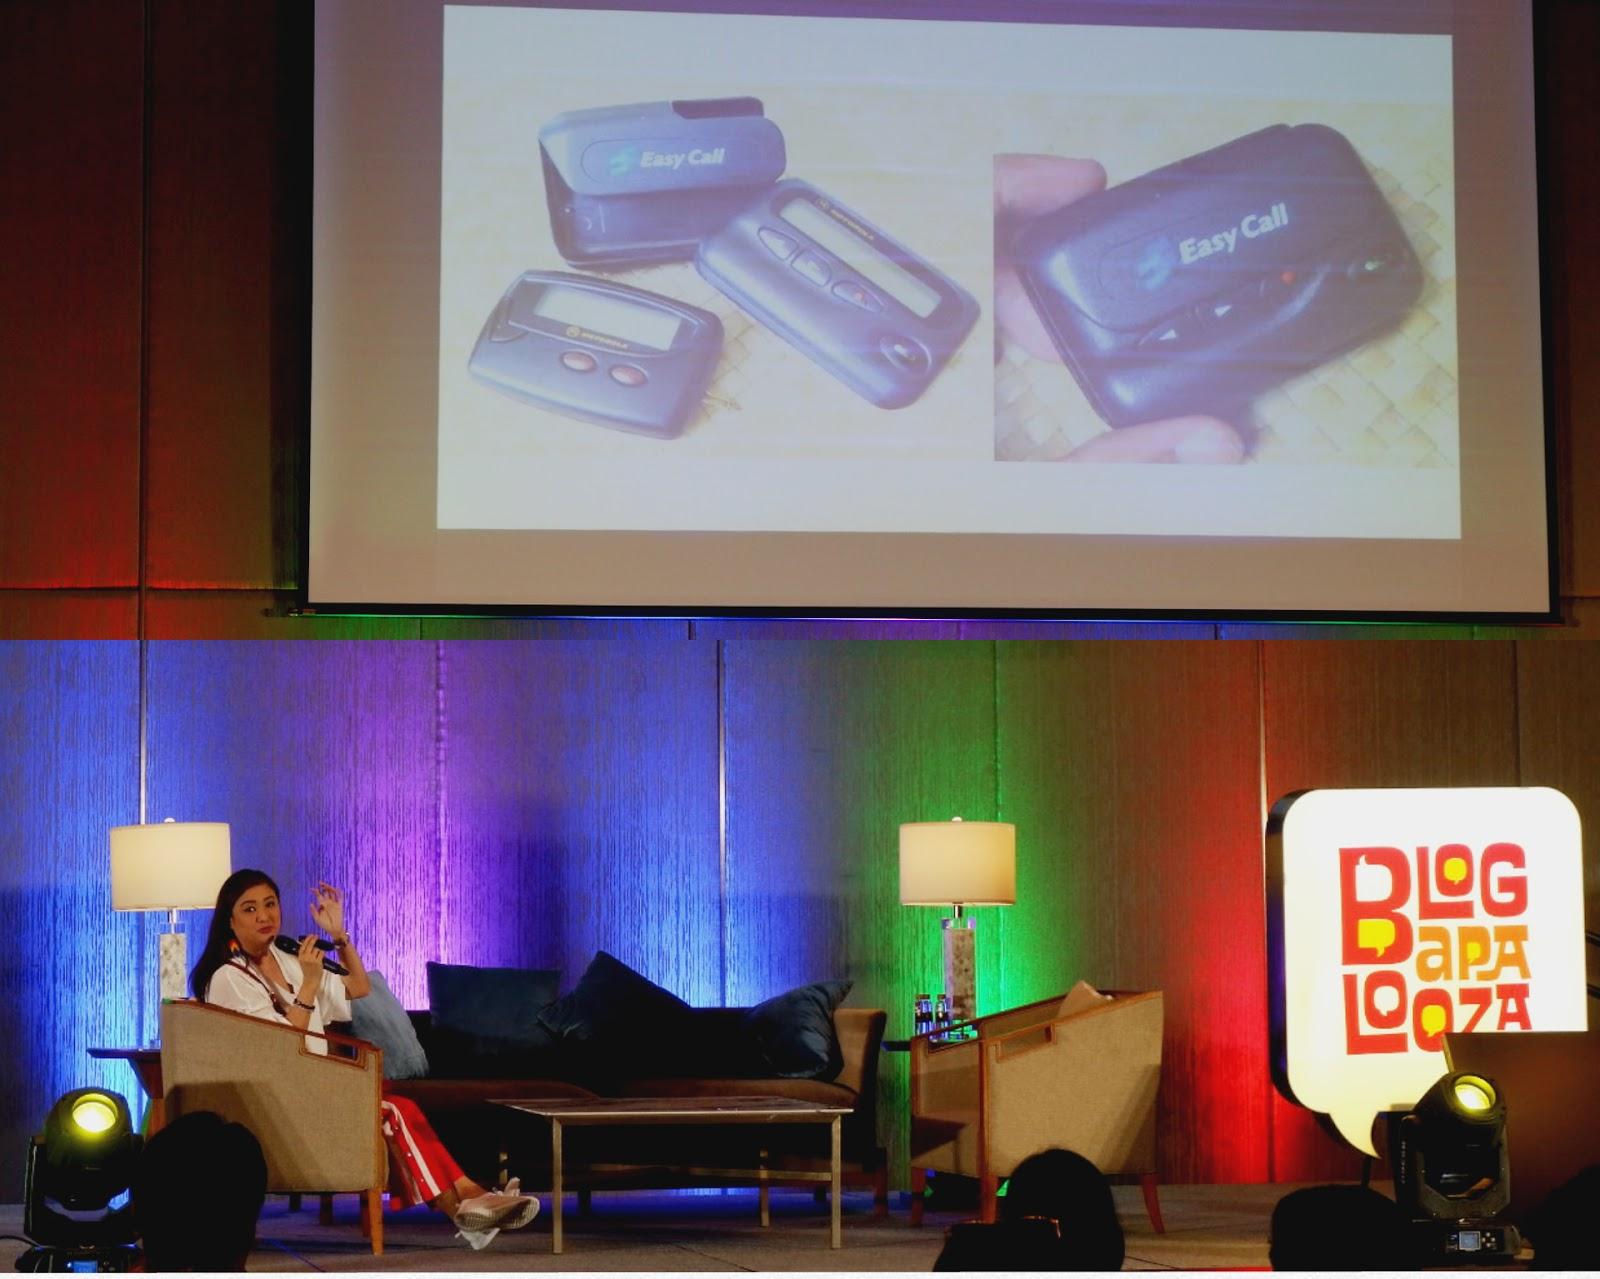 christine babao having a talk at Blogapalooza 2018